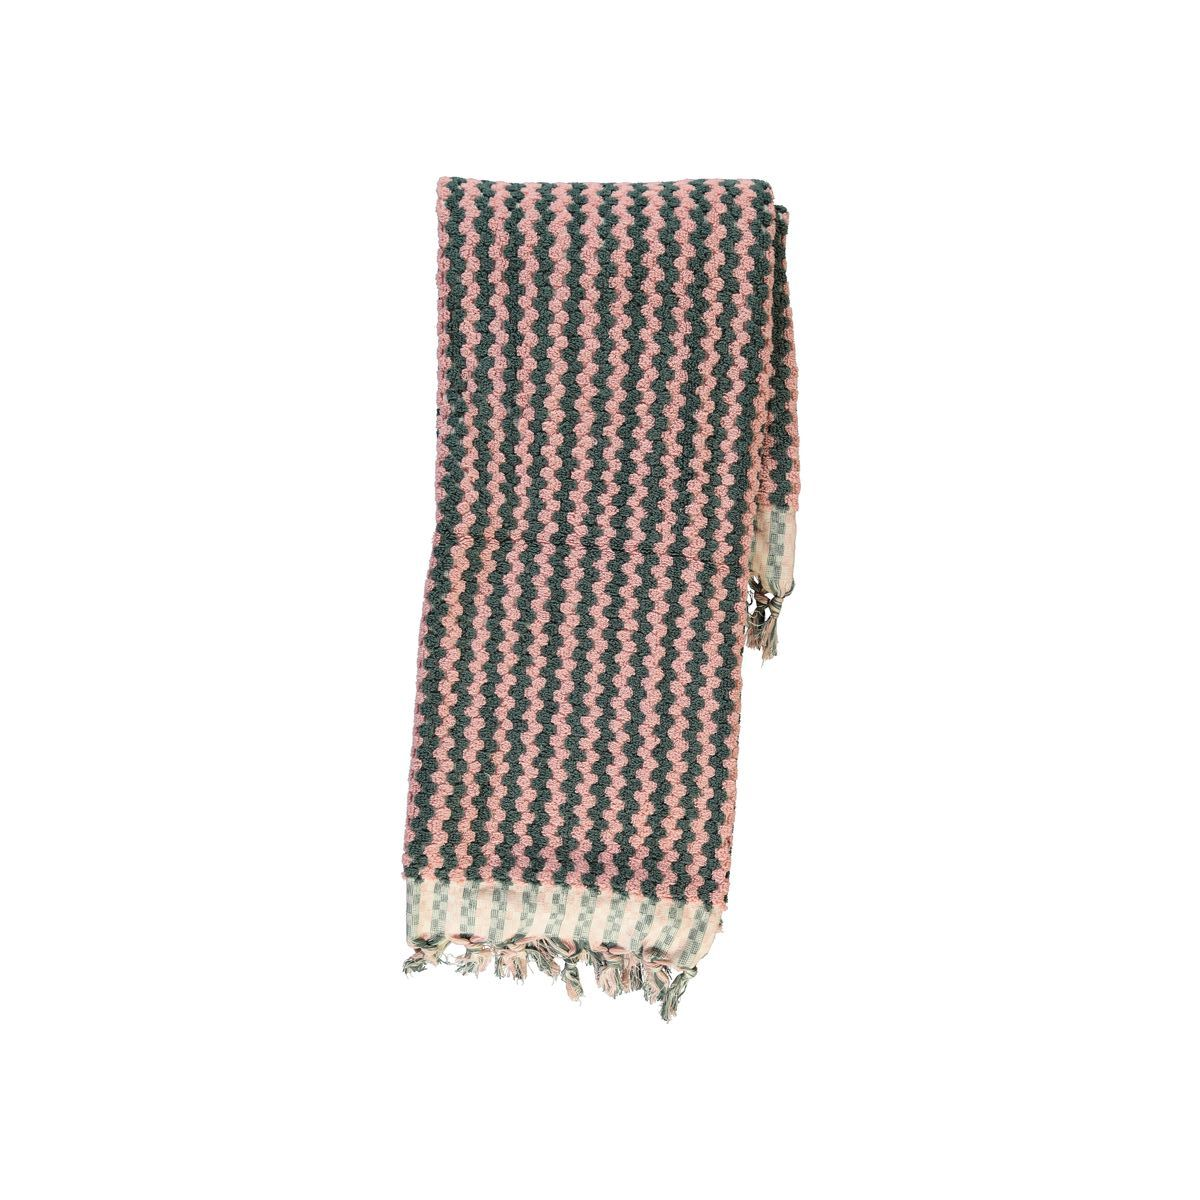 Towel Classic / Wire - Dusty Rose/Dark Grey